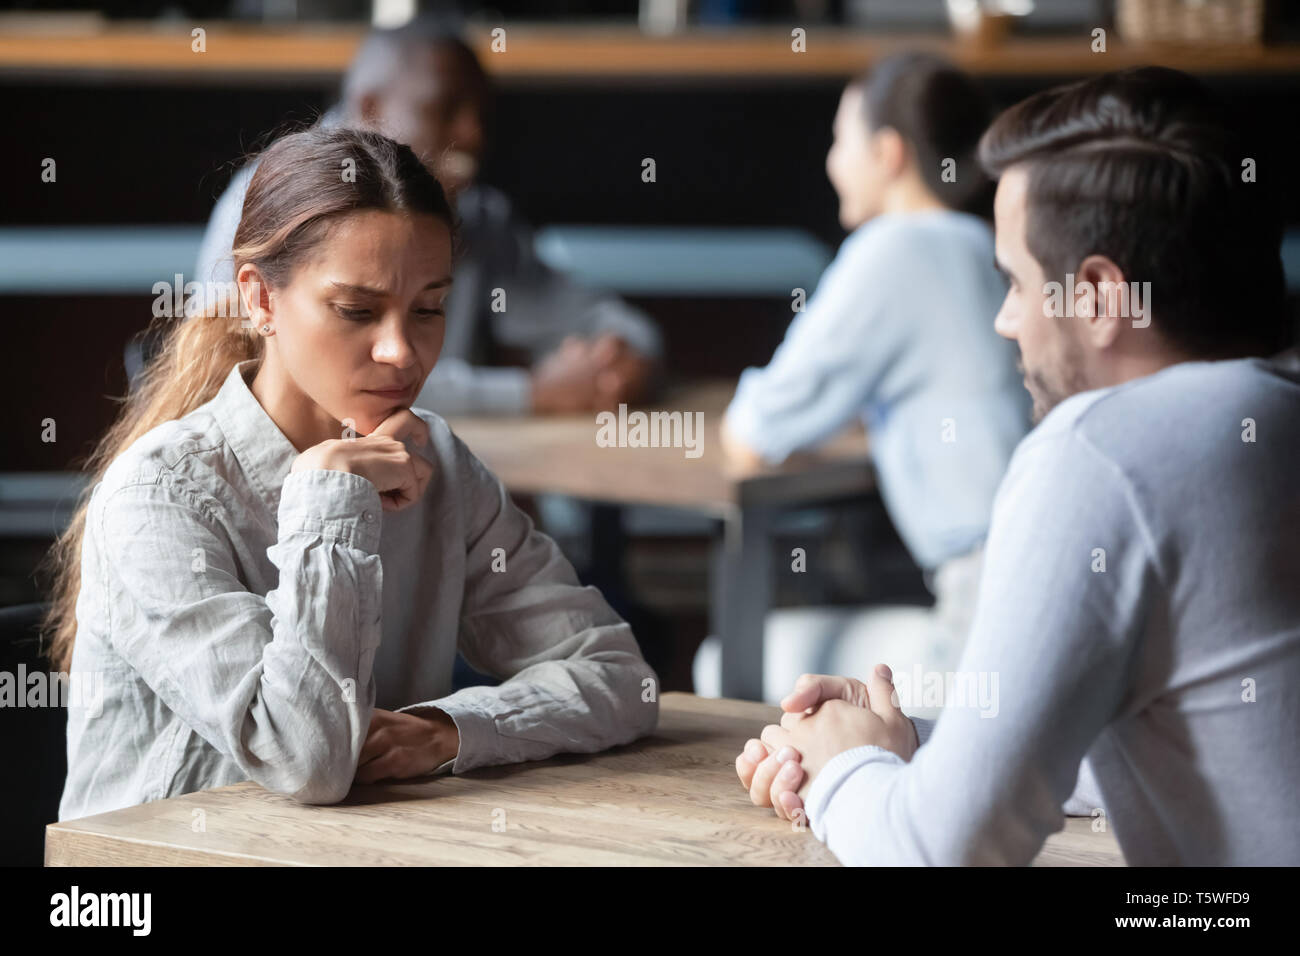 speed dating timide online dating akademiker